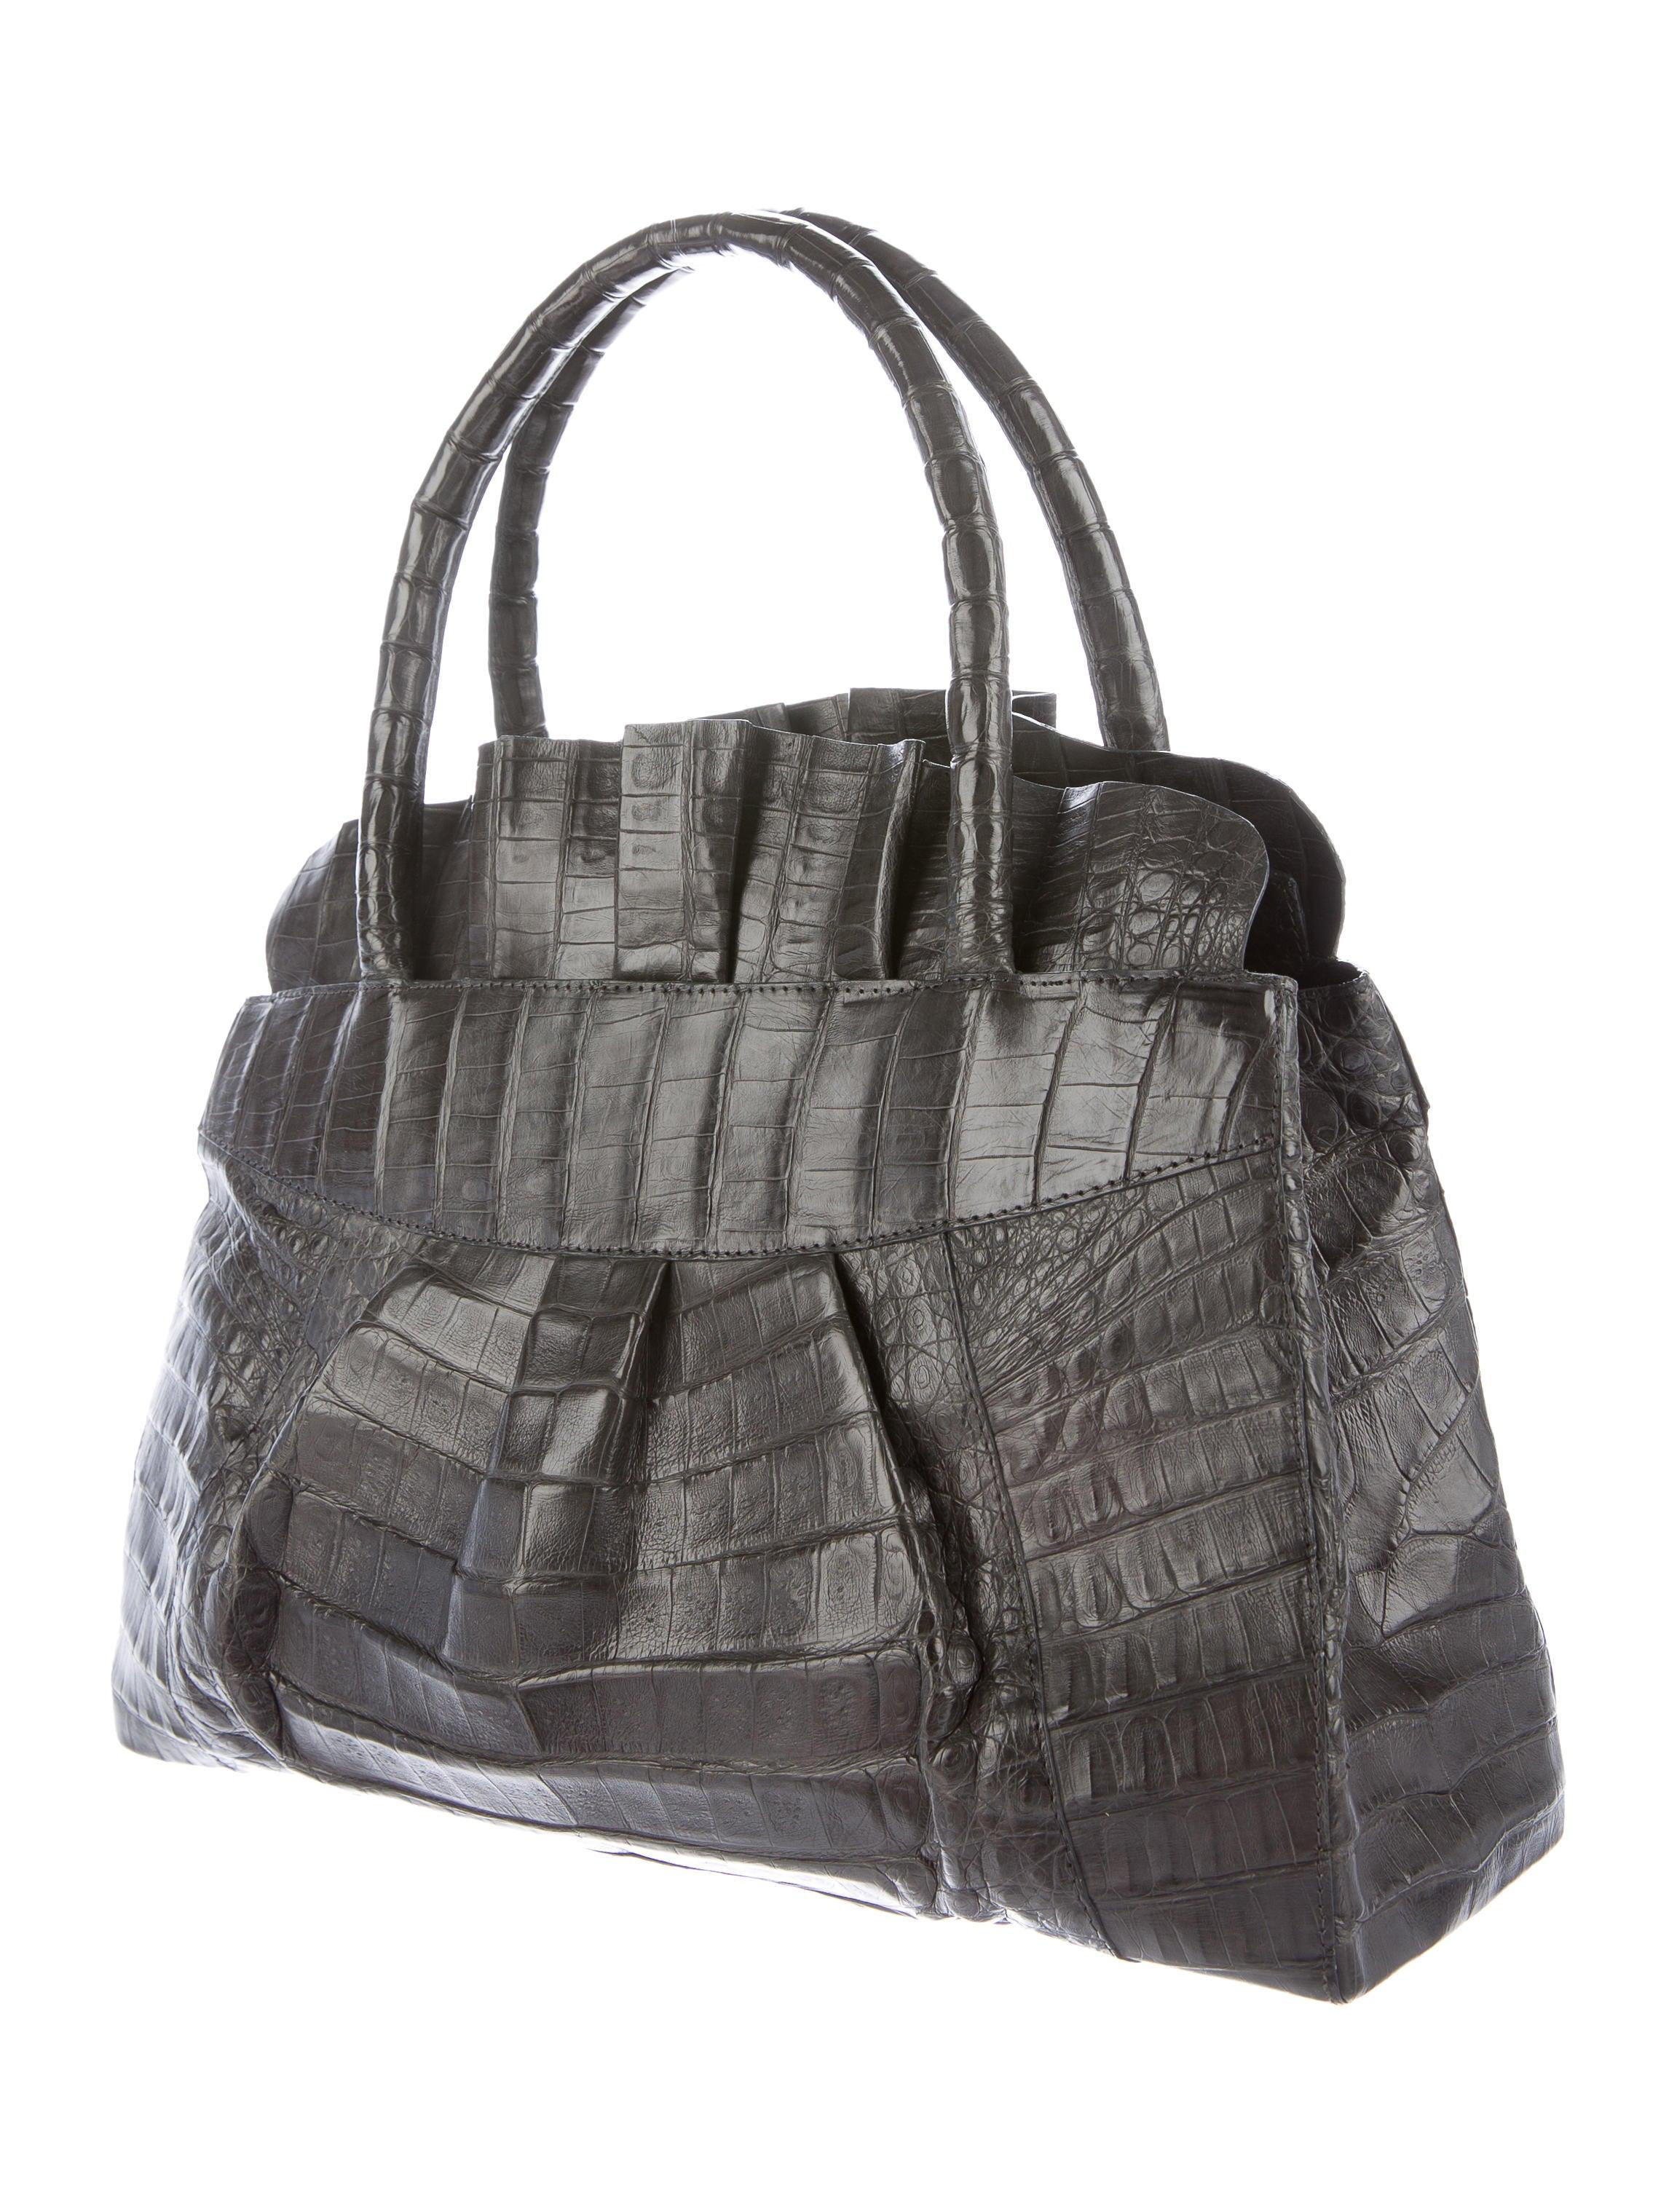 Nancy gonzalez crocodile zip tote handbags nan22792 for Nancy gonzalez crocodile tote